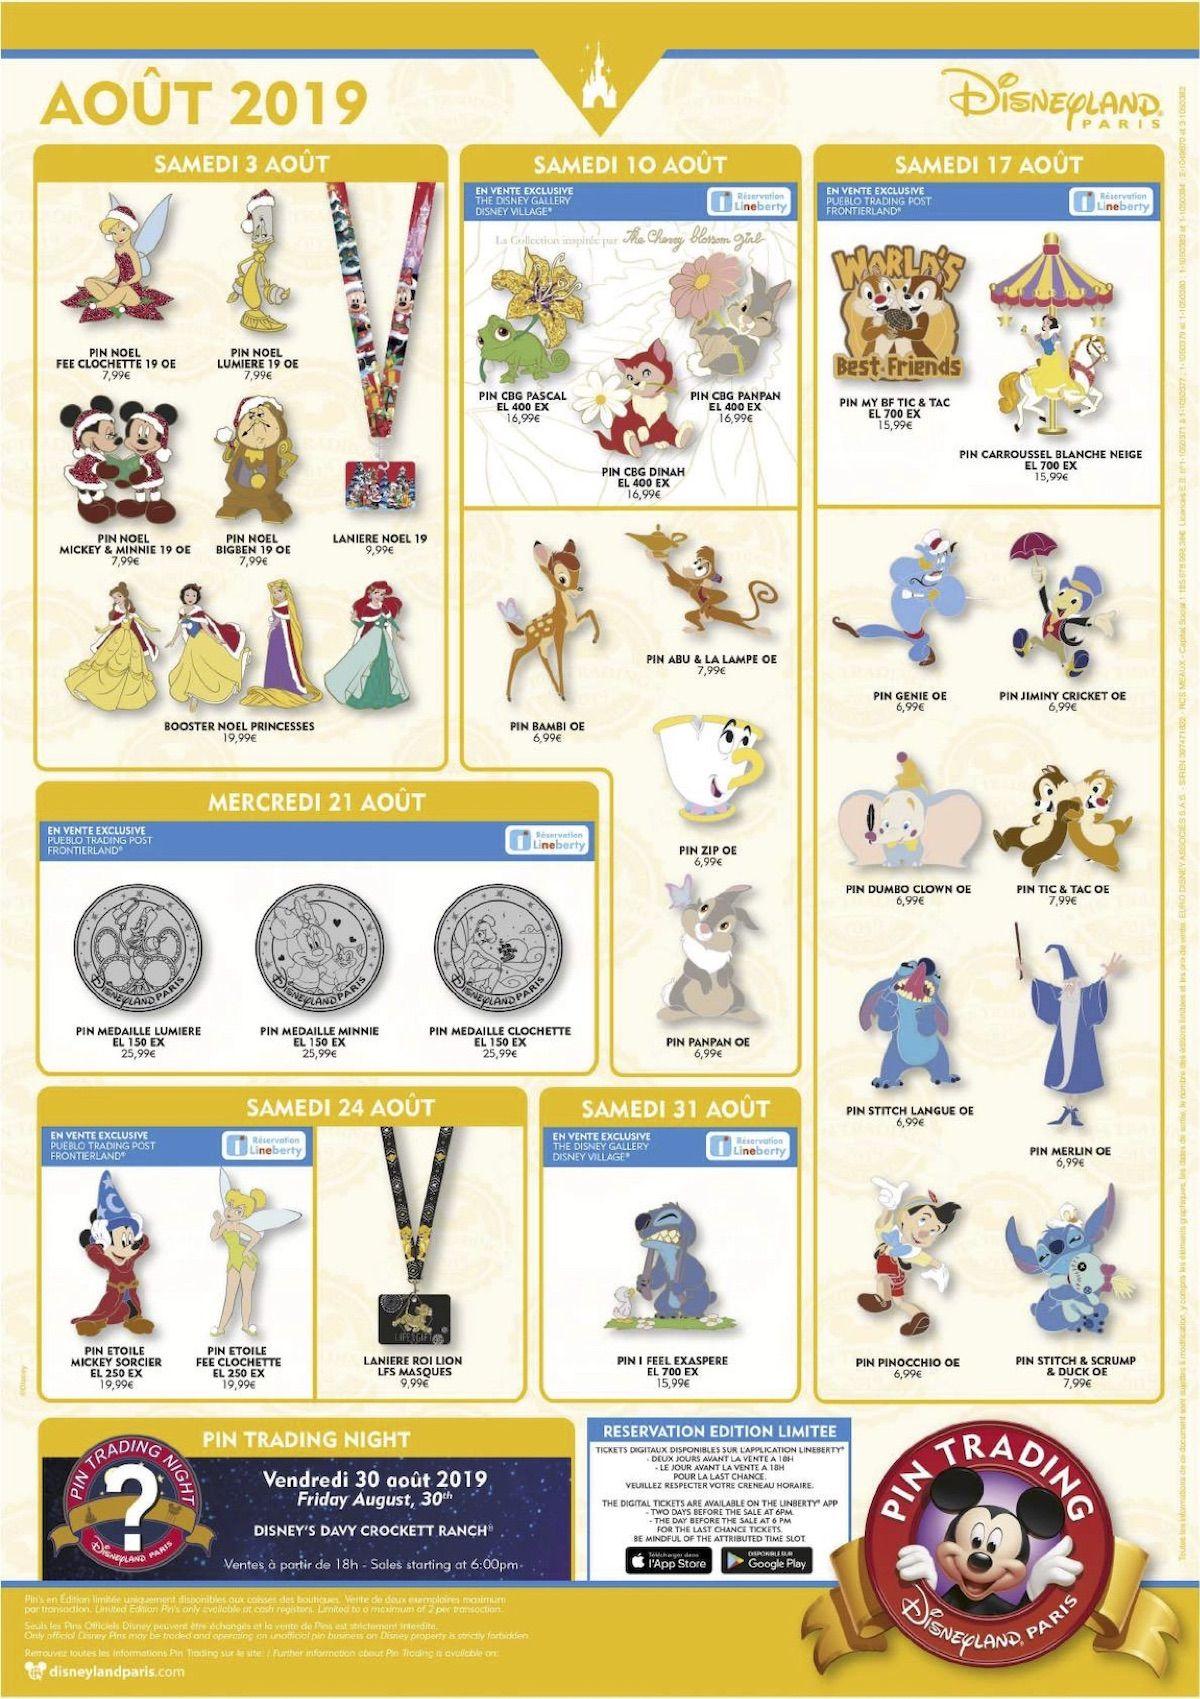 Disney Christmas 2020 Pin Trading Disneyland Paris August 2019 Pins   Disney Pins Blog in 2020